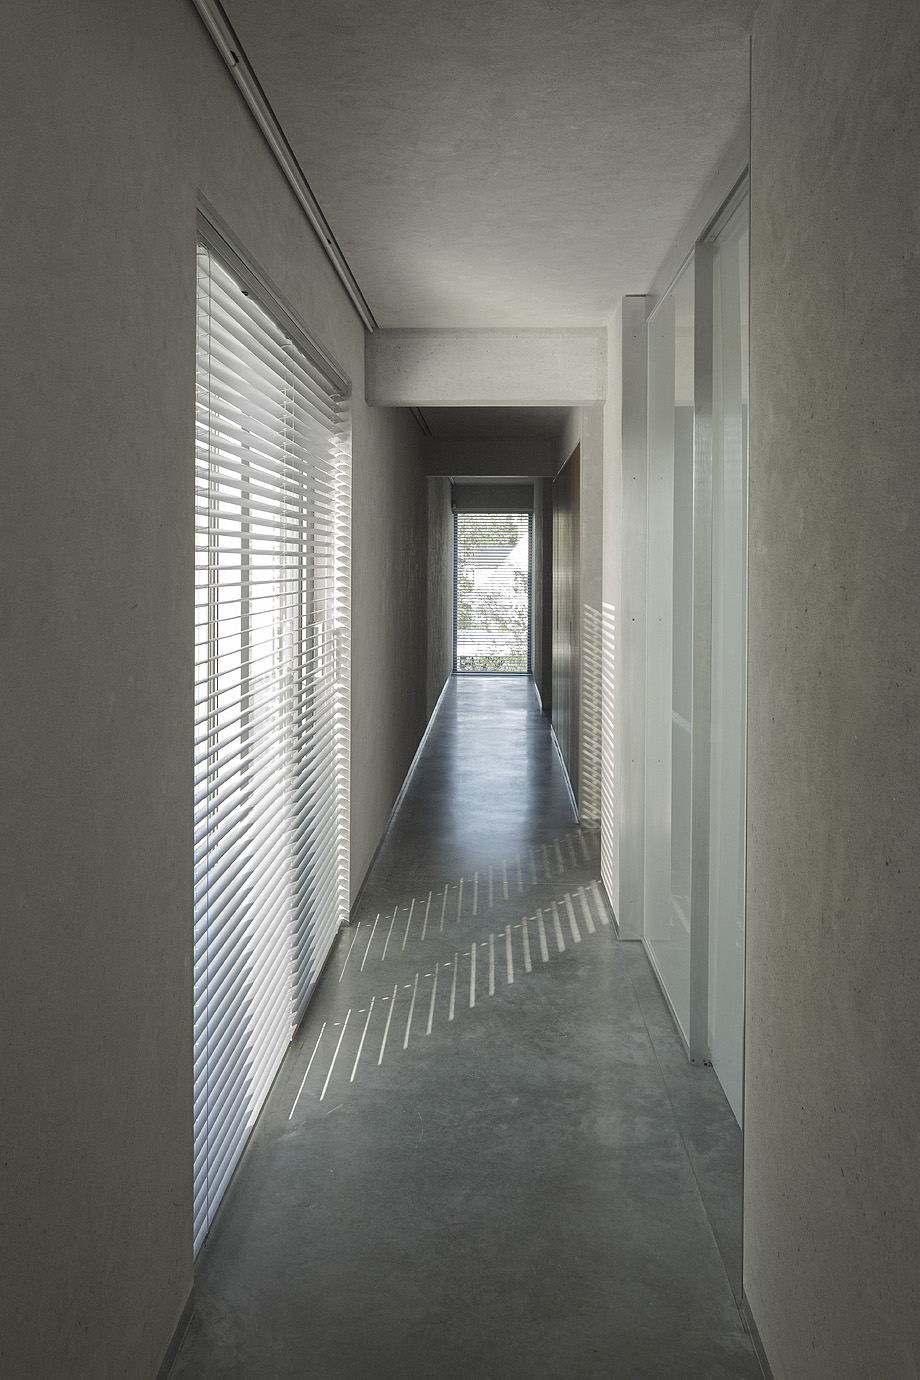 casa vle de ism architecten y paul ibens (17)